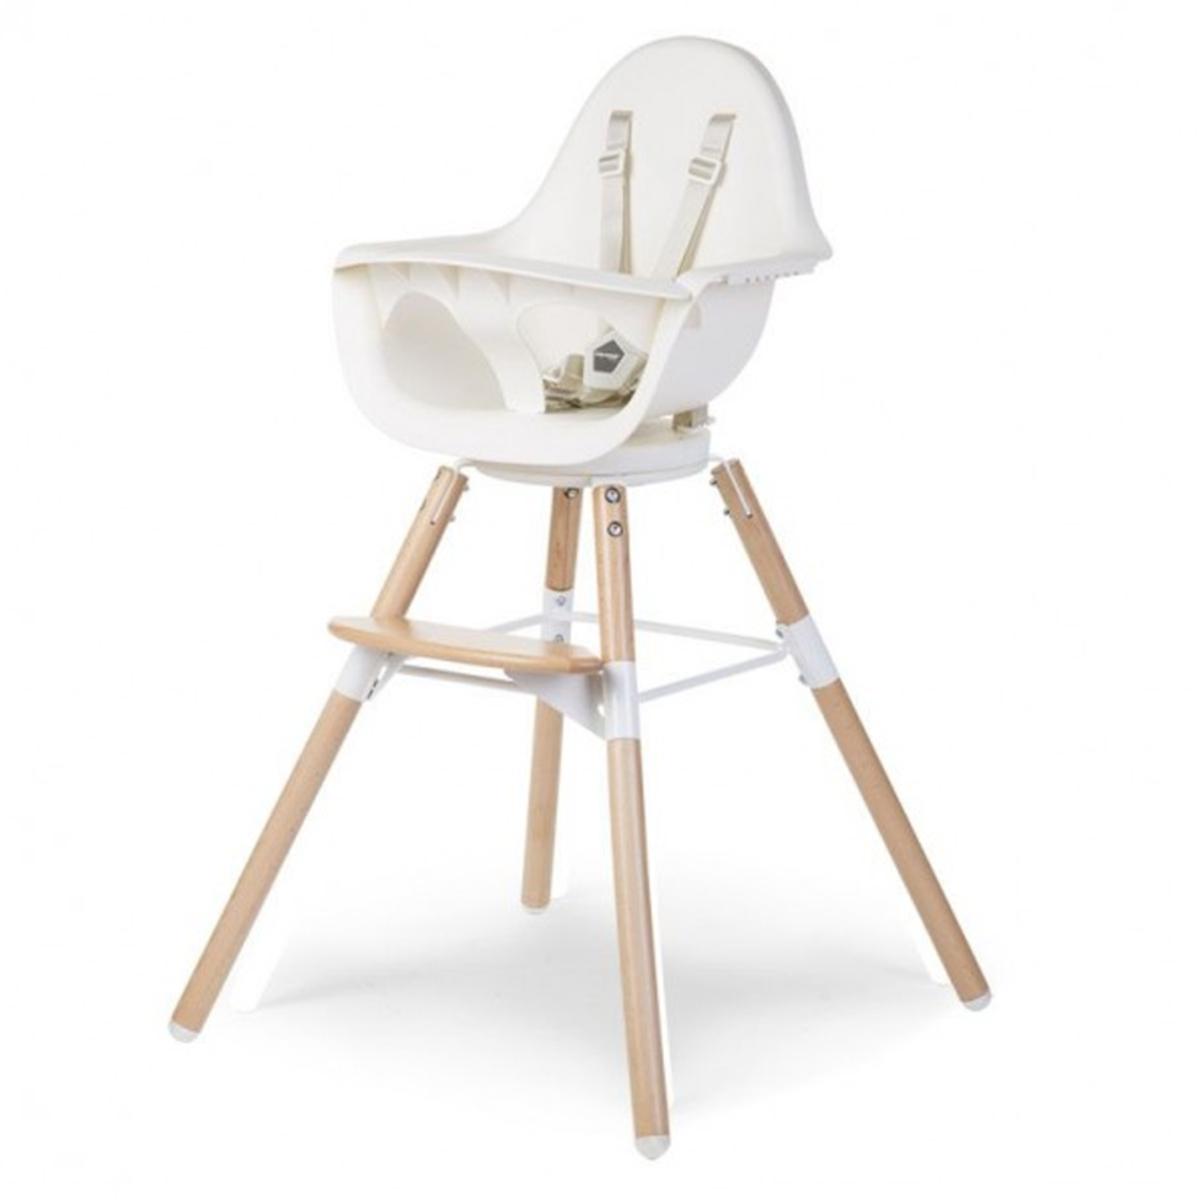 Chaise haute Chaise Haute Evolu One.80° Pieds Bois - Blanc Chaise Haute Evolu One.80° Pieds Bois - Blanc